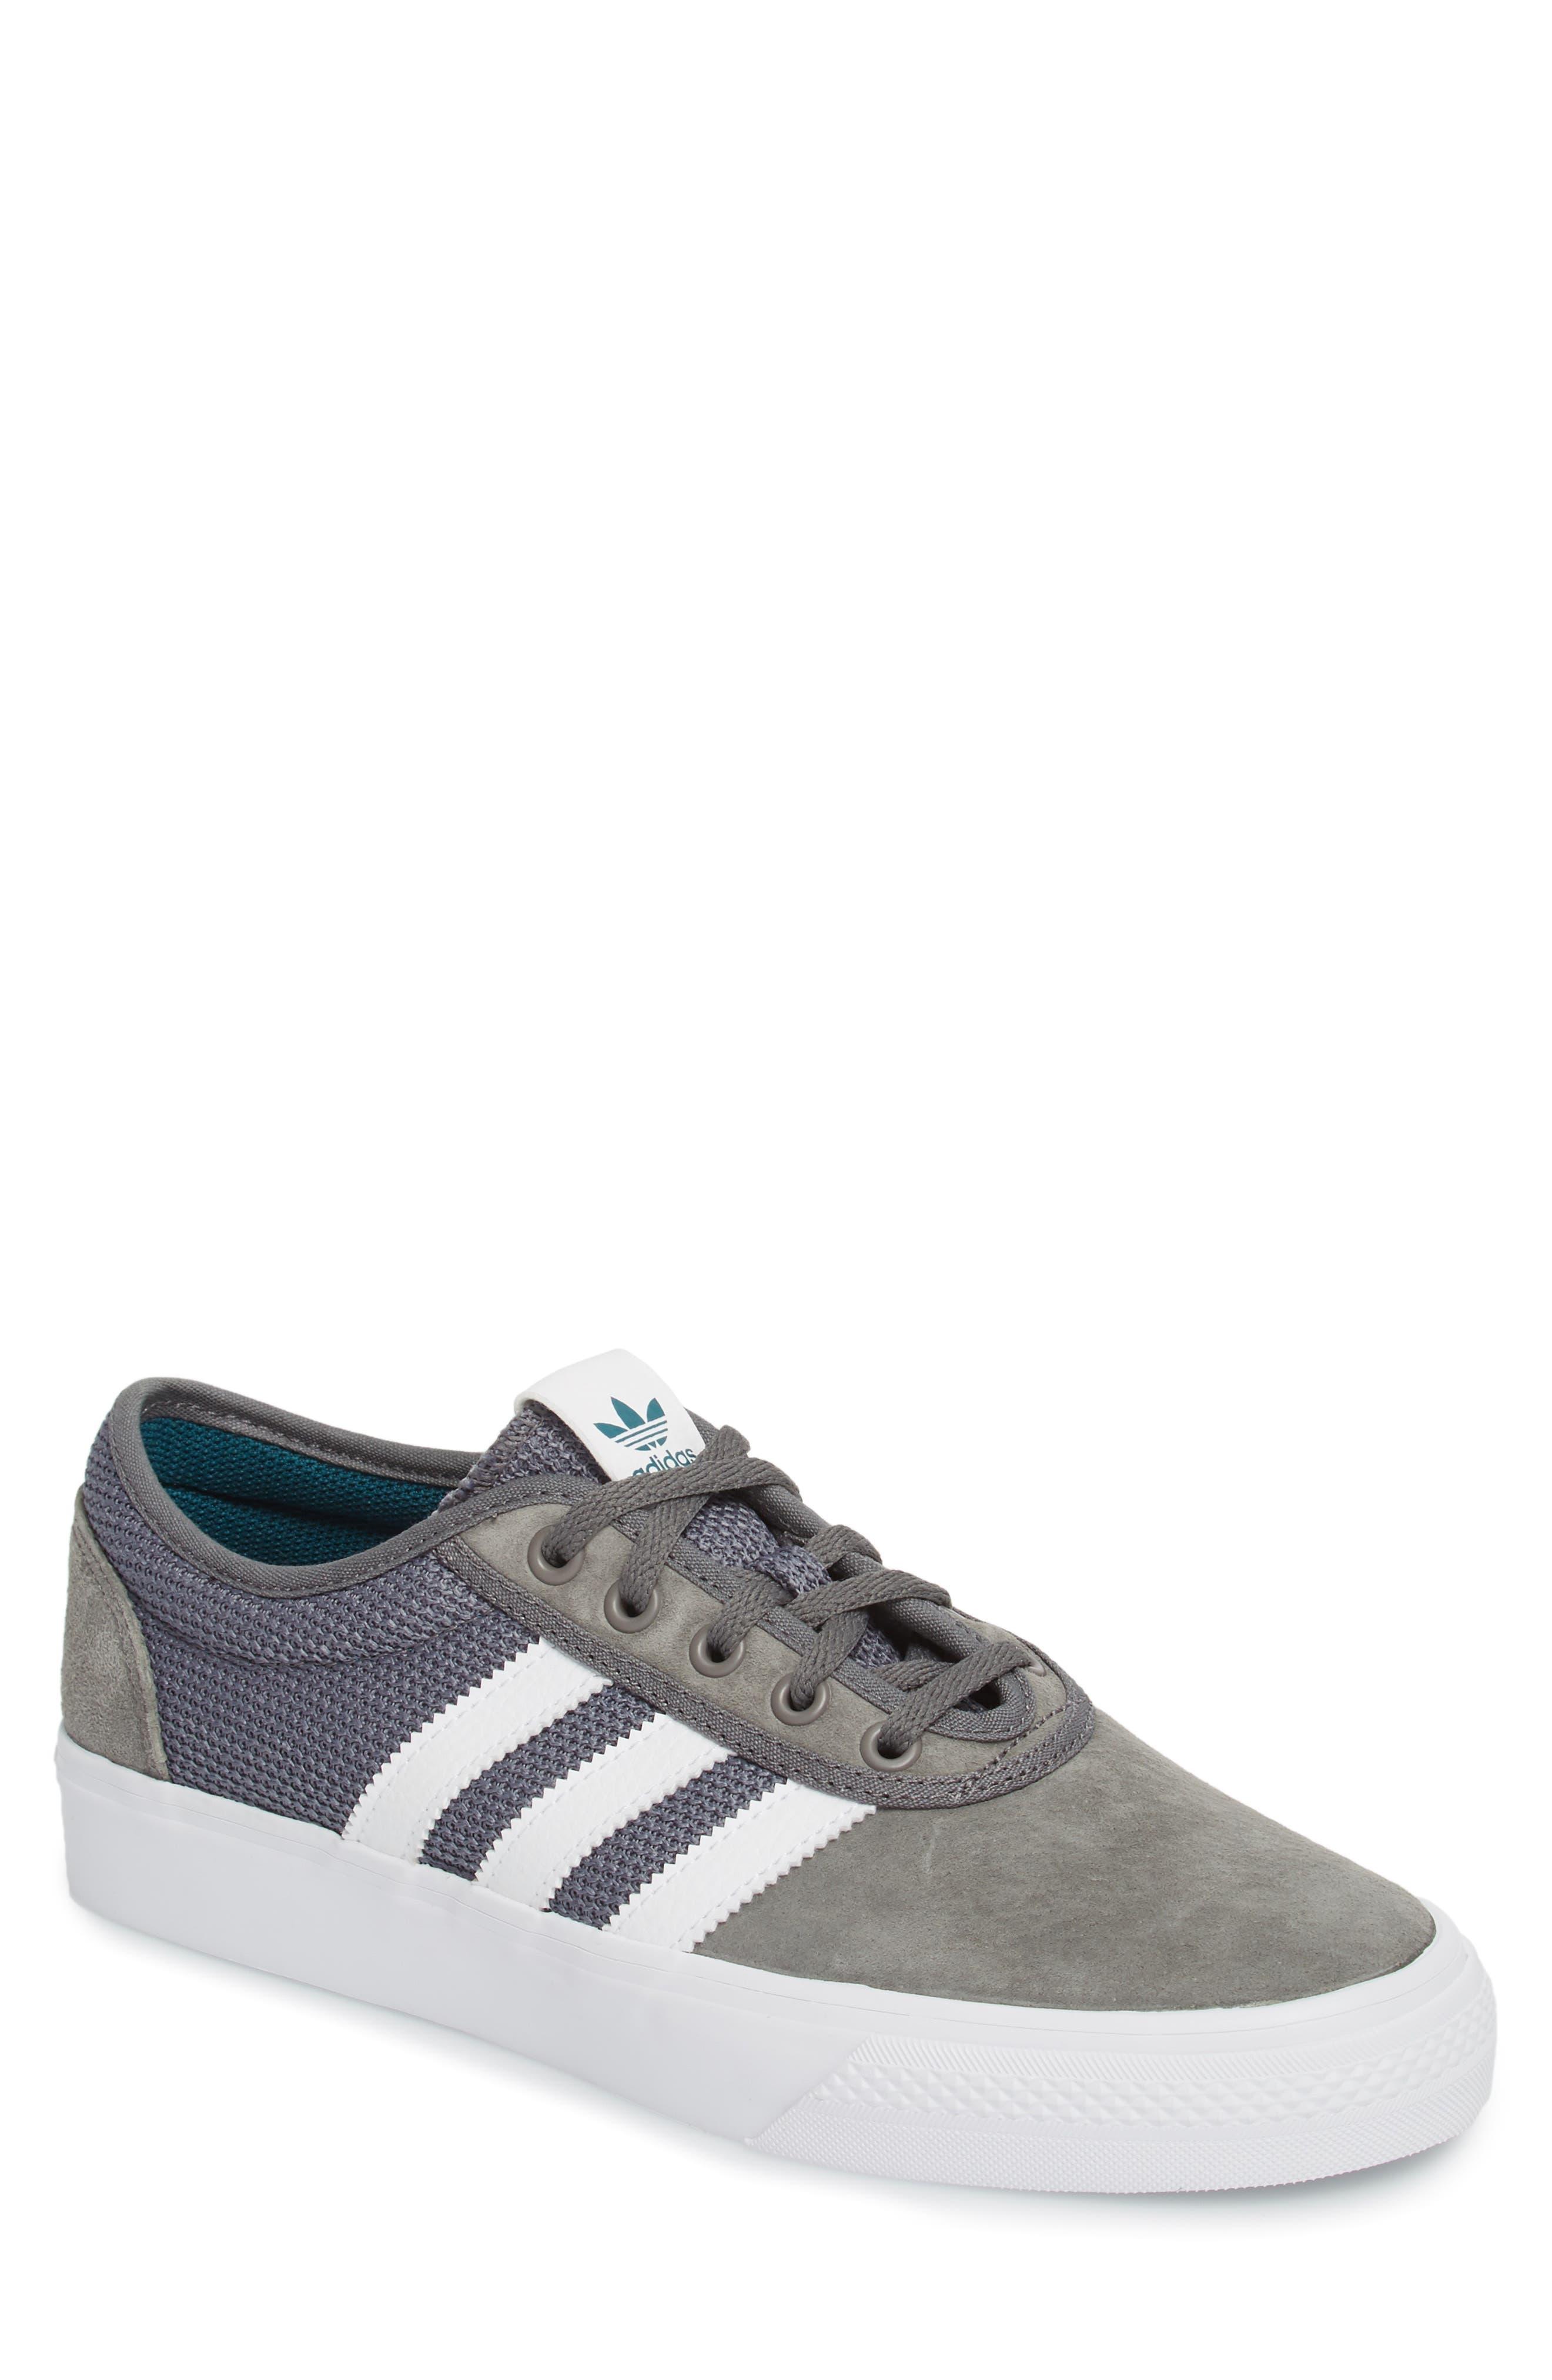 adi-Ease Sneaker,                             Main thumbnail 1, color,                             023